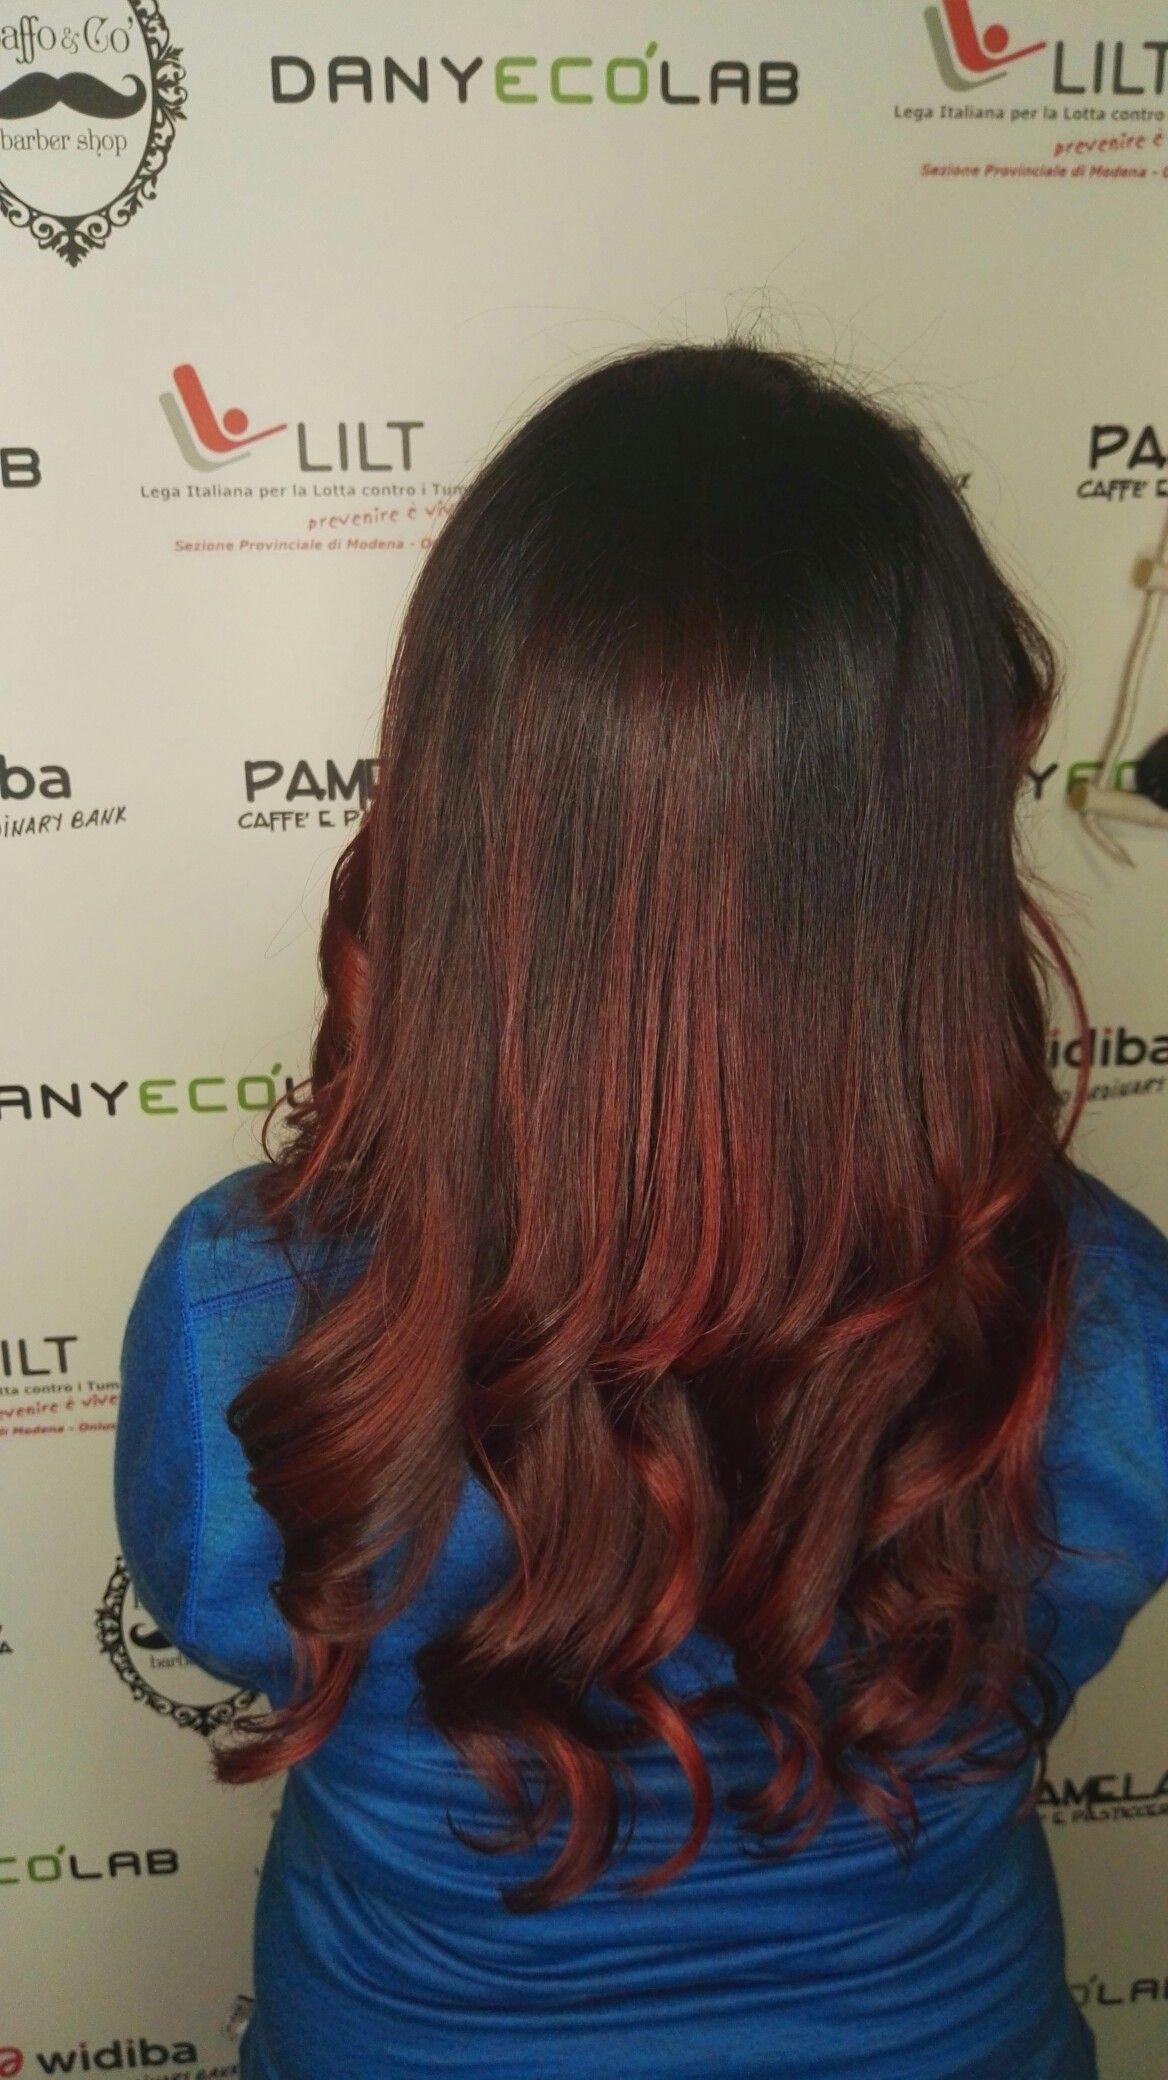 balayage marron glace'-red passion moganodany eco lab | capelli